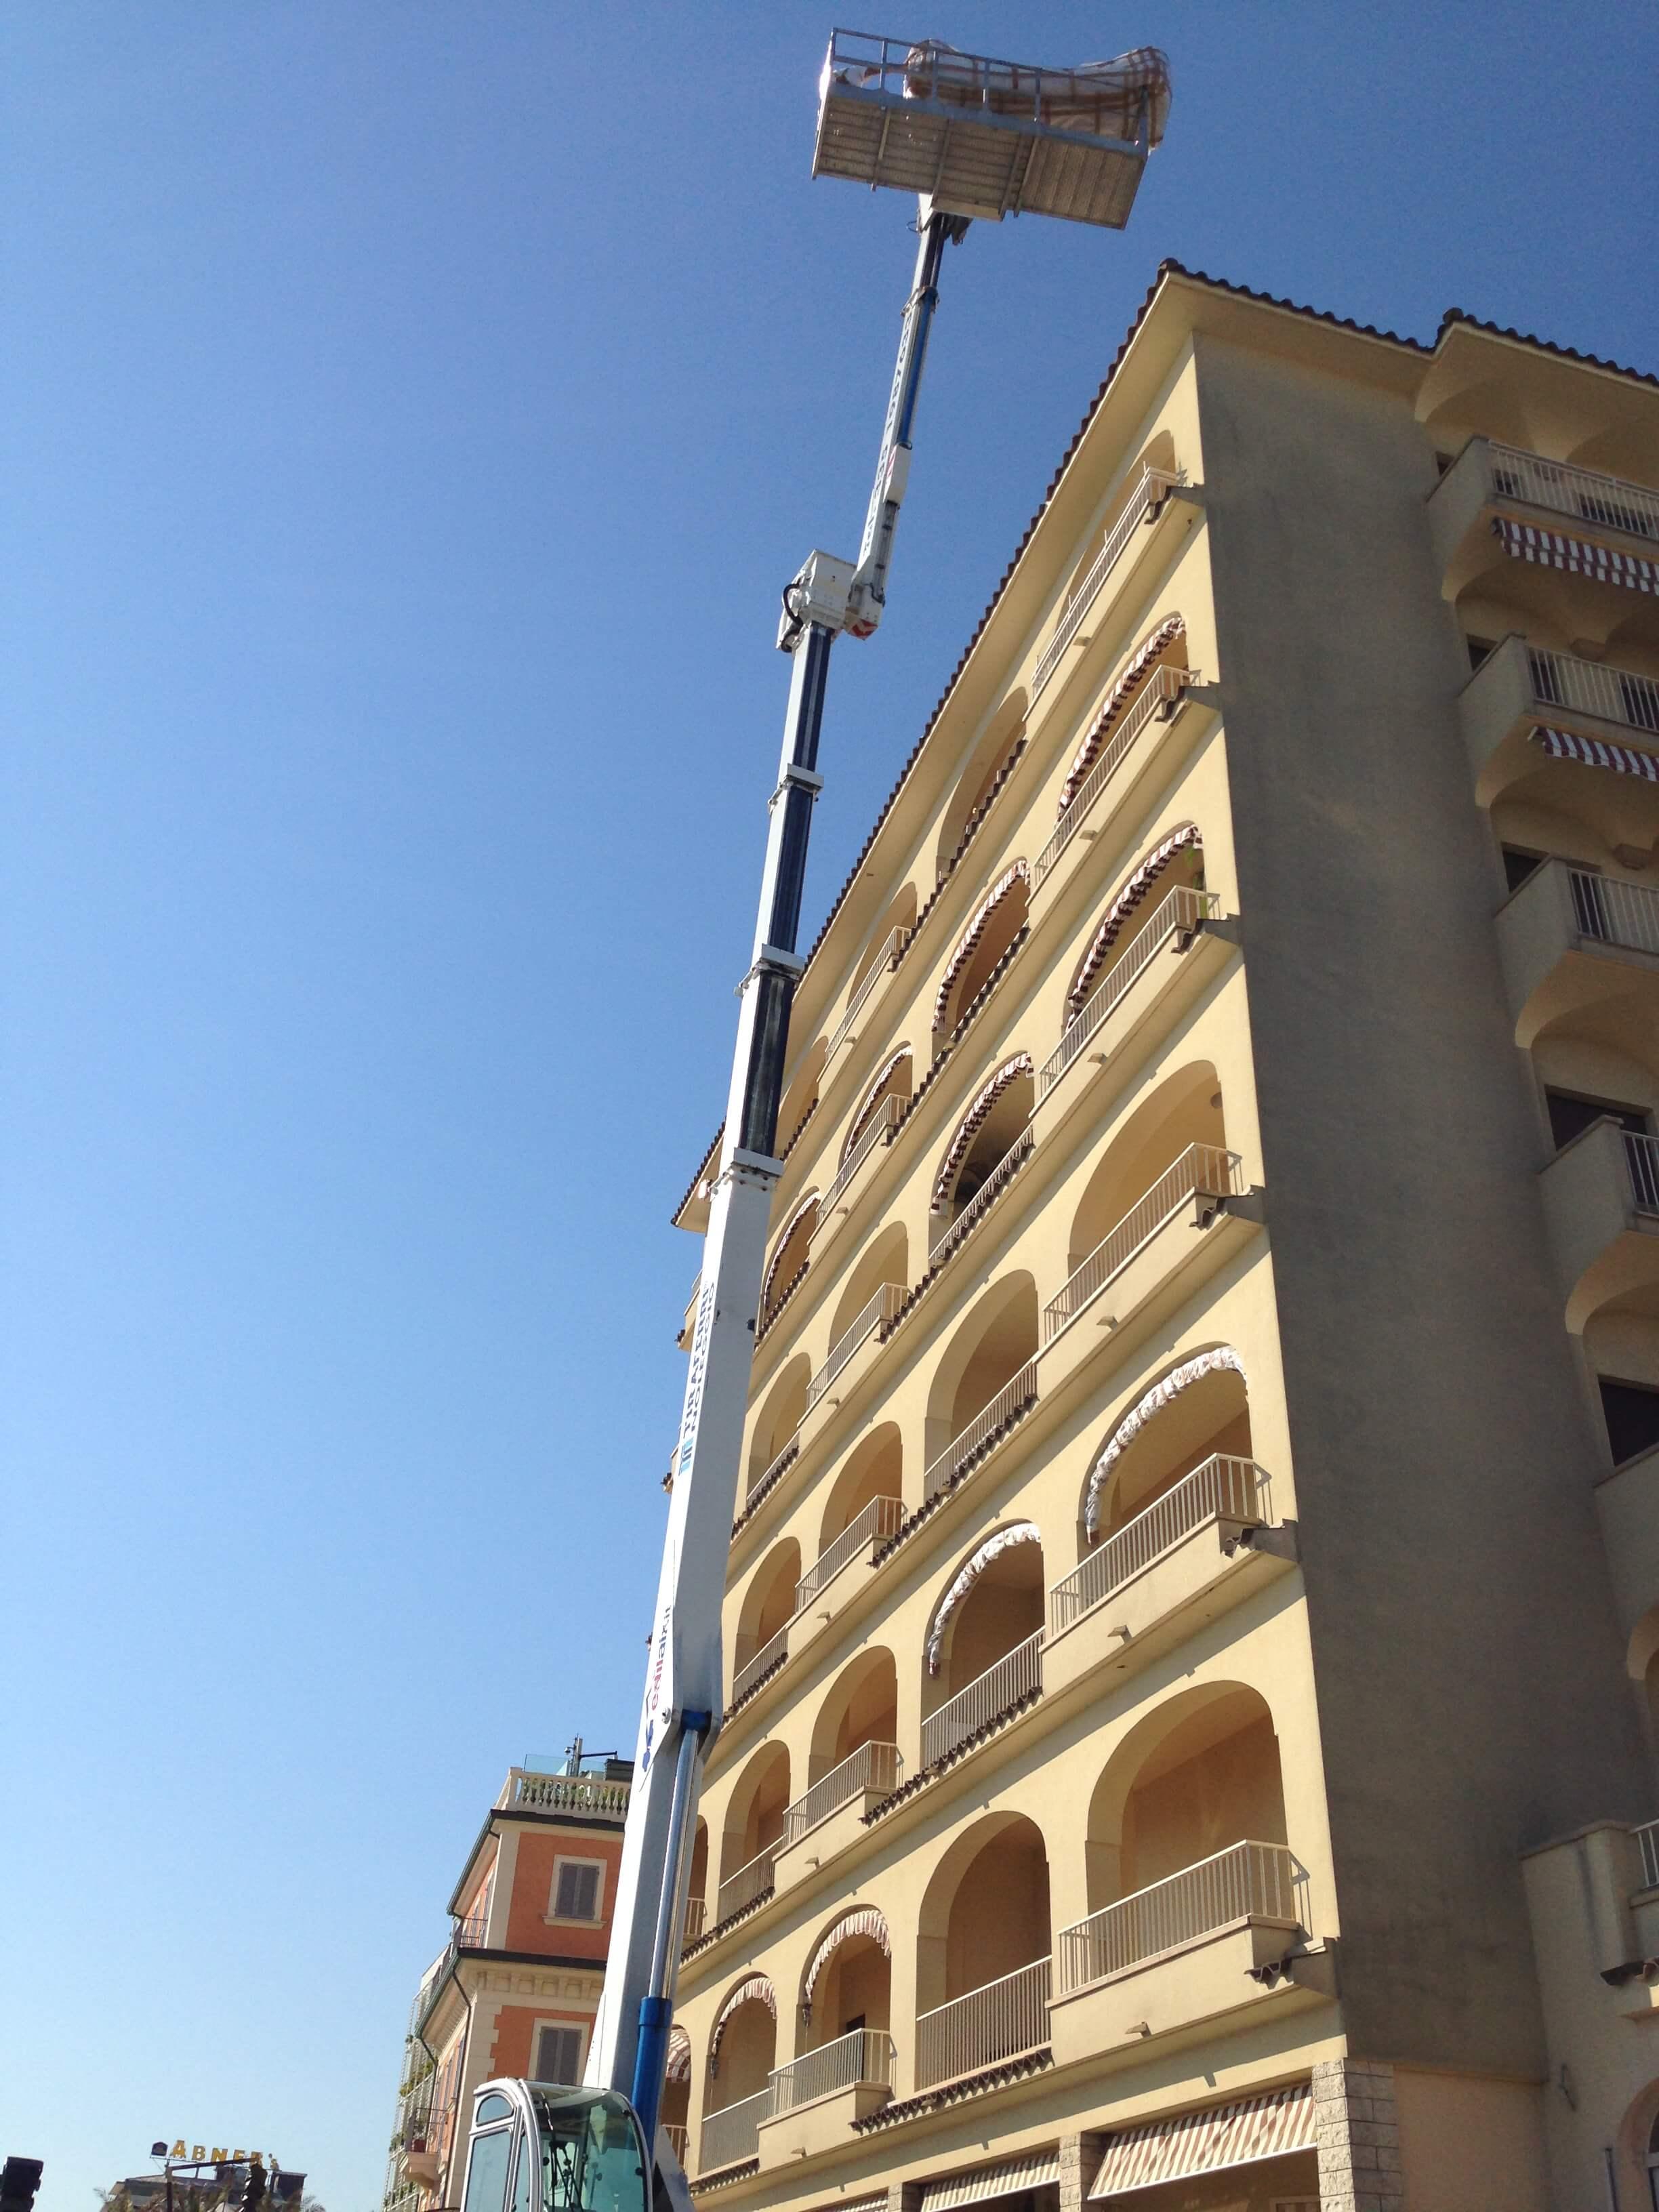 piattaforma aerea a Perugia